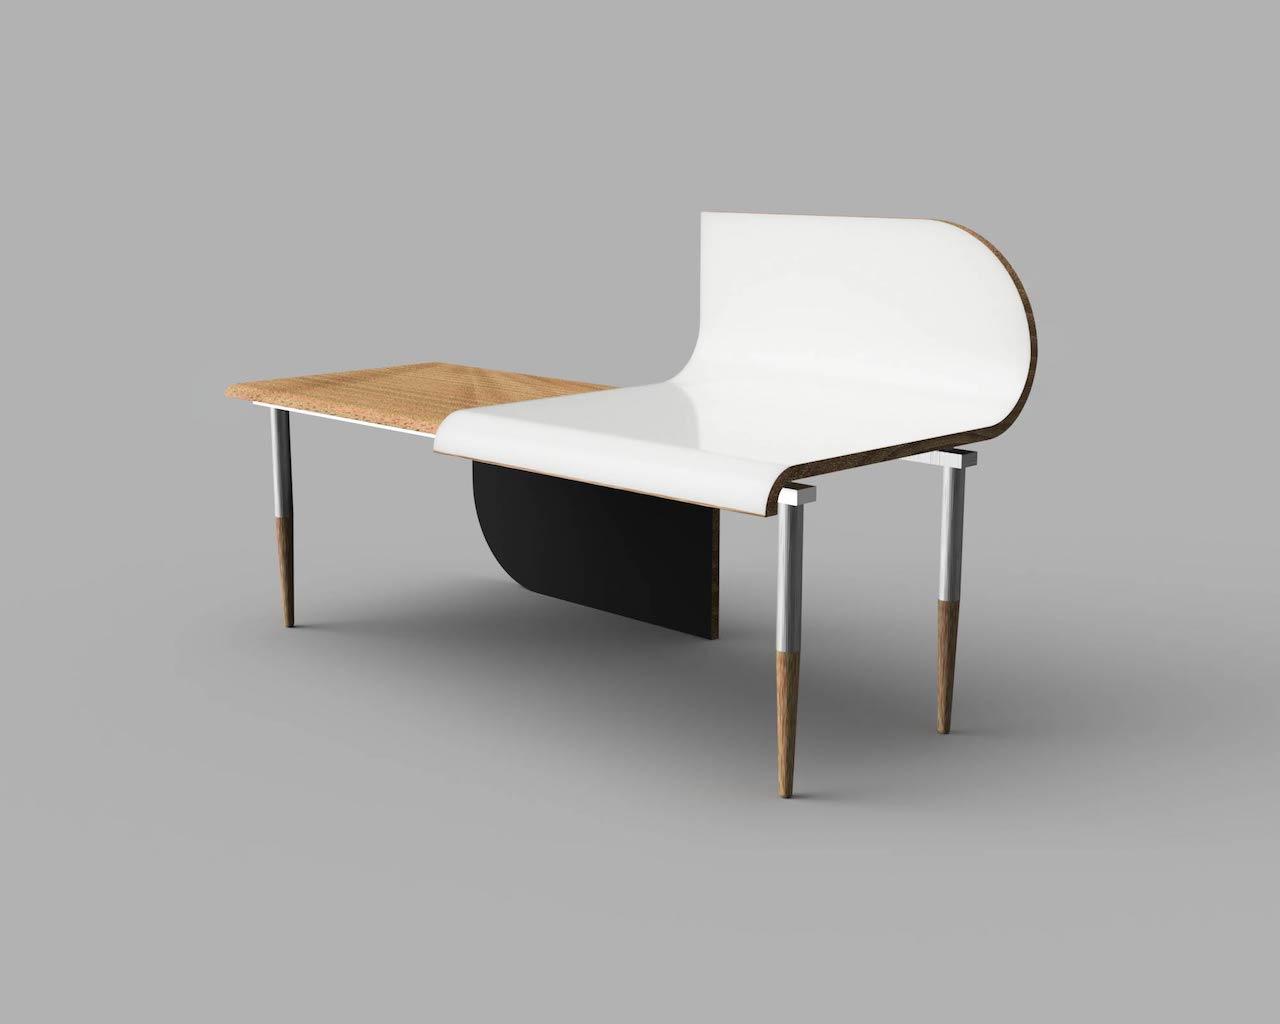 Yin Yang desk